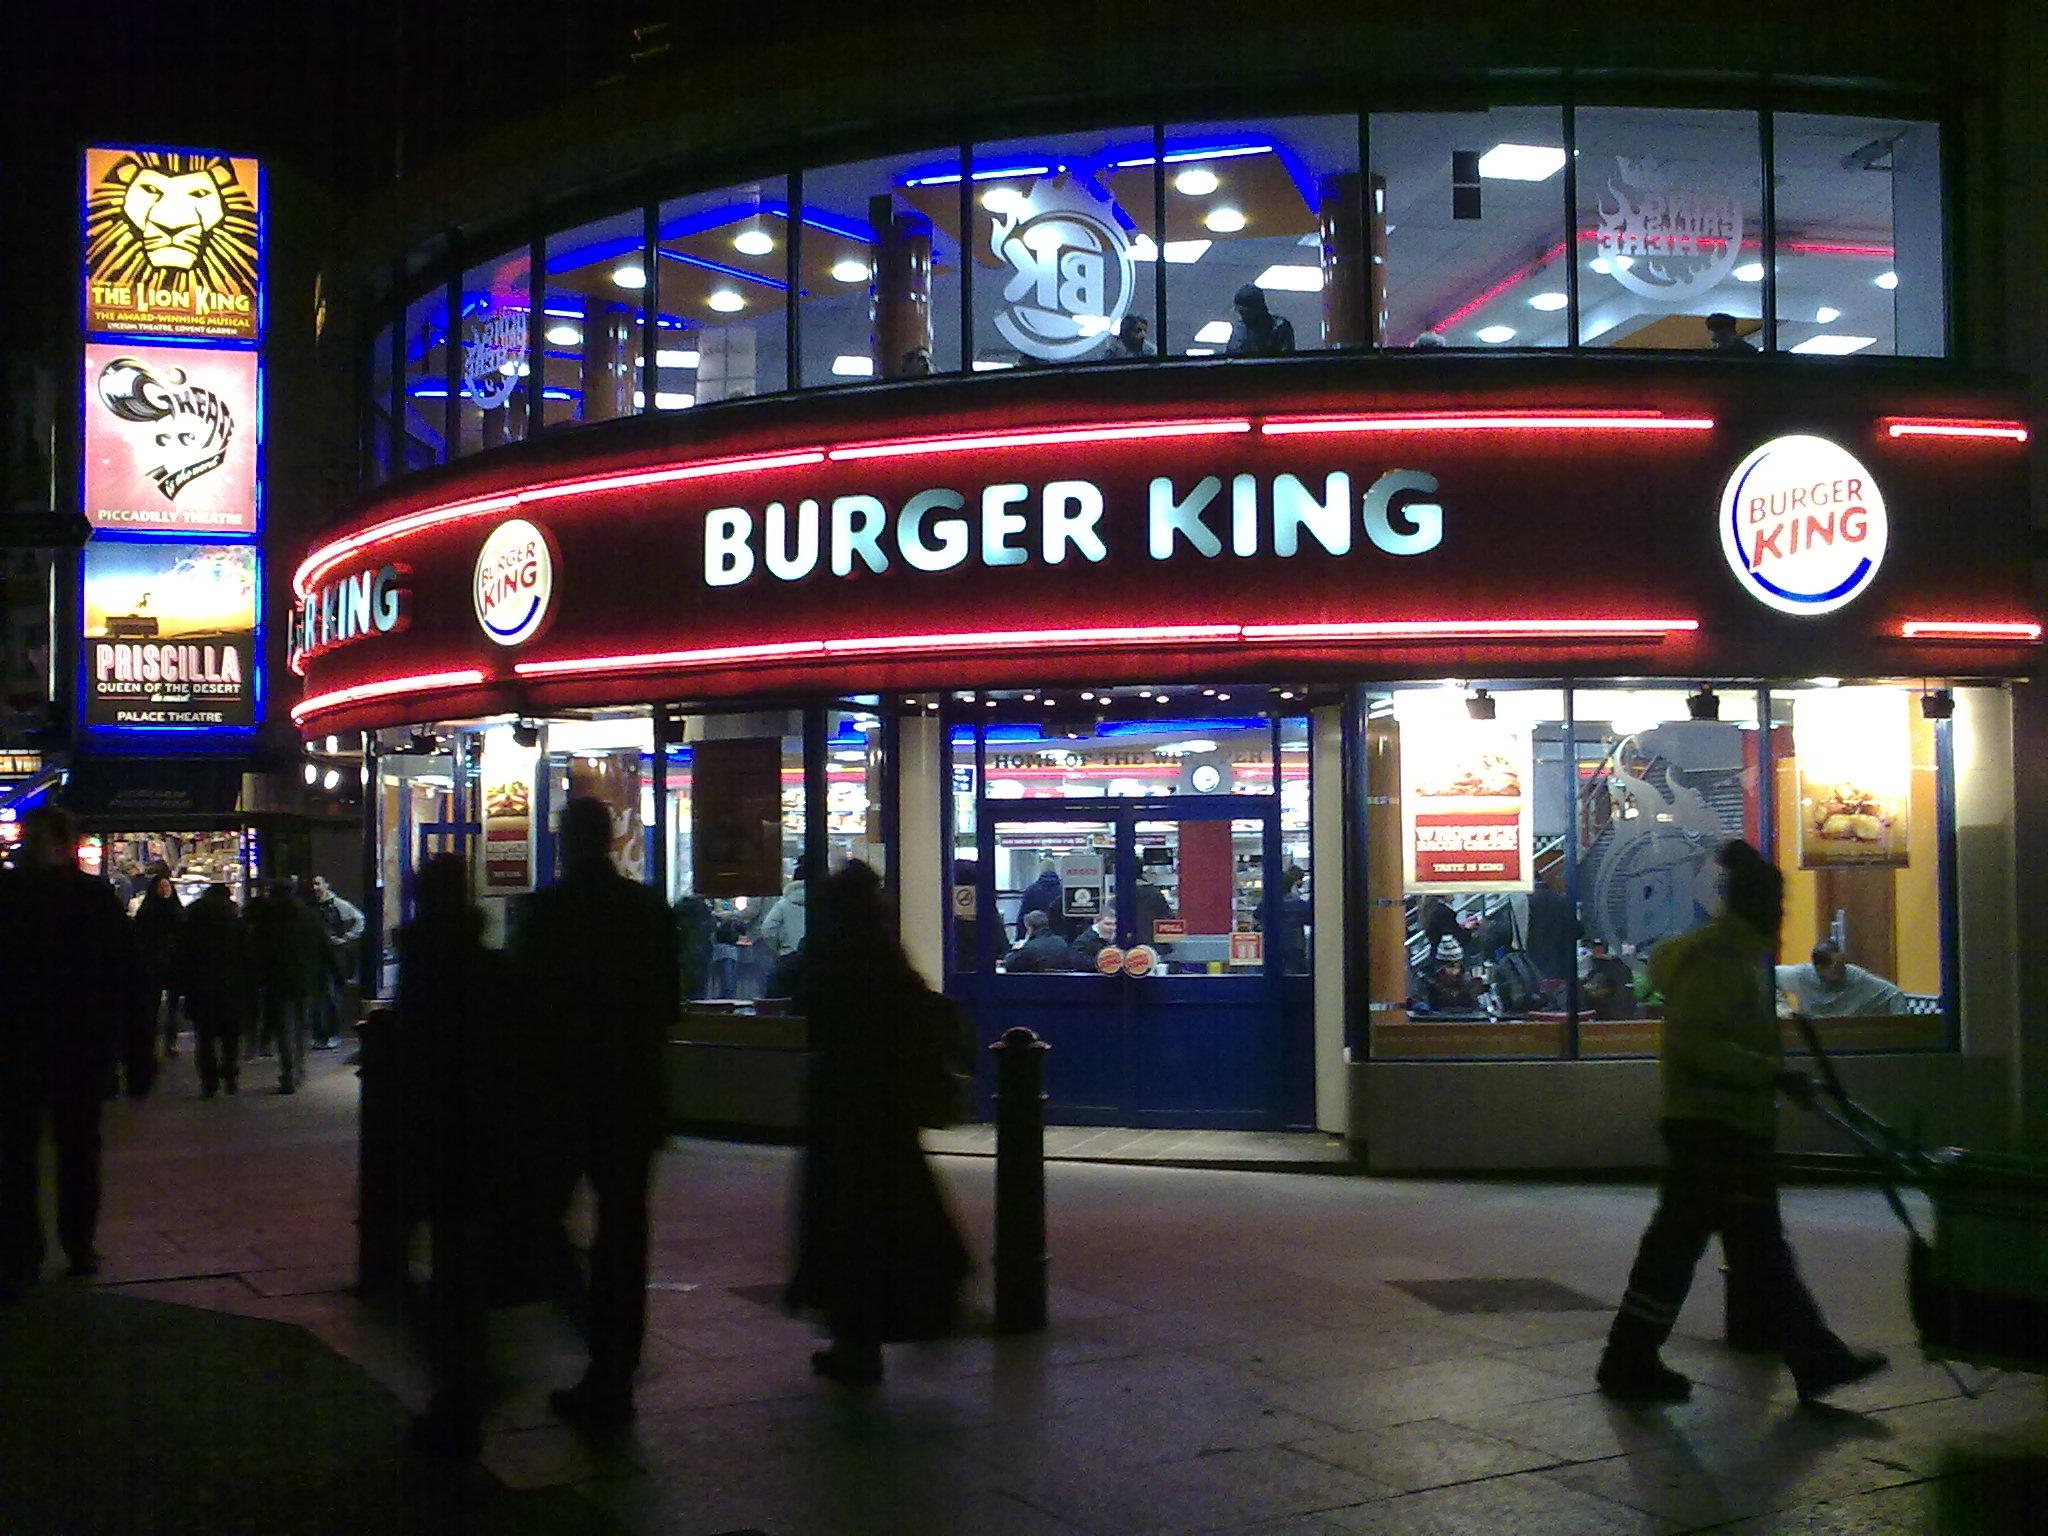 Description Leicester Square Burger King.jpg